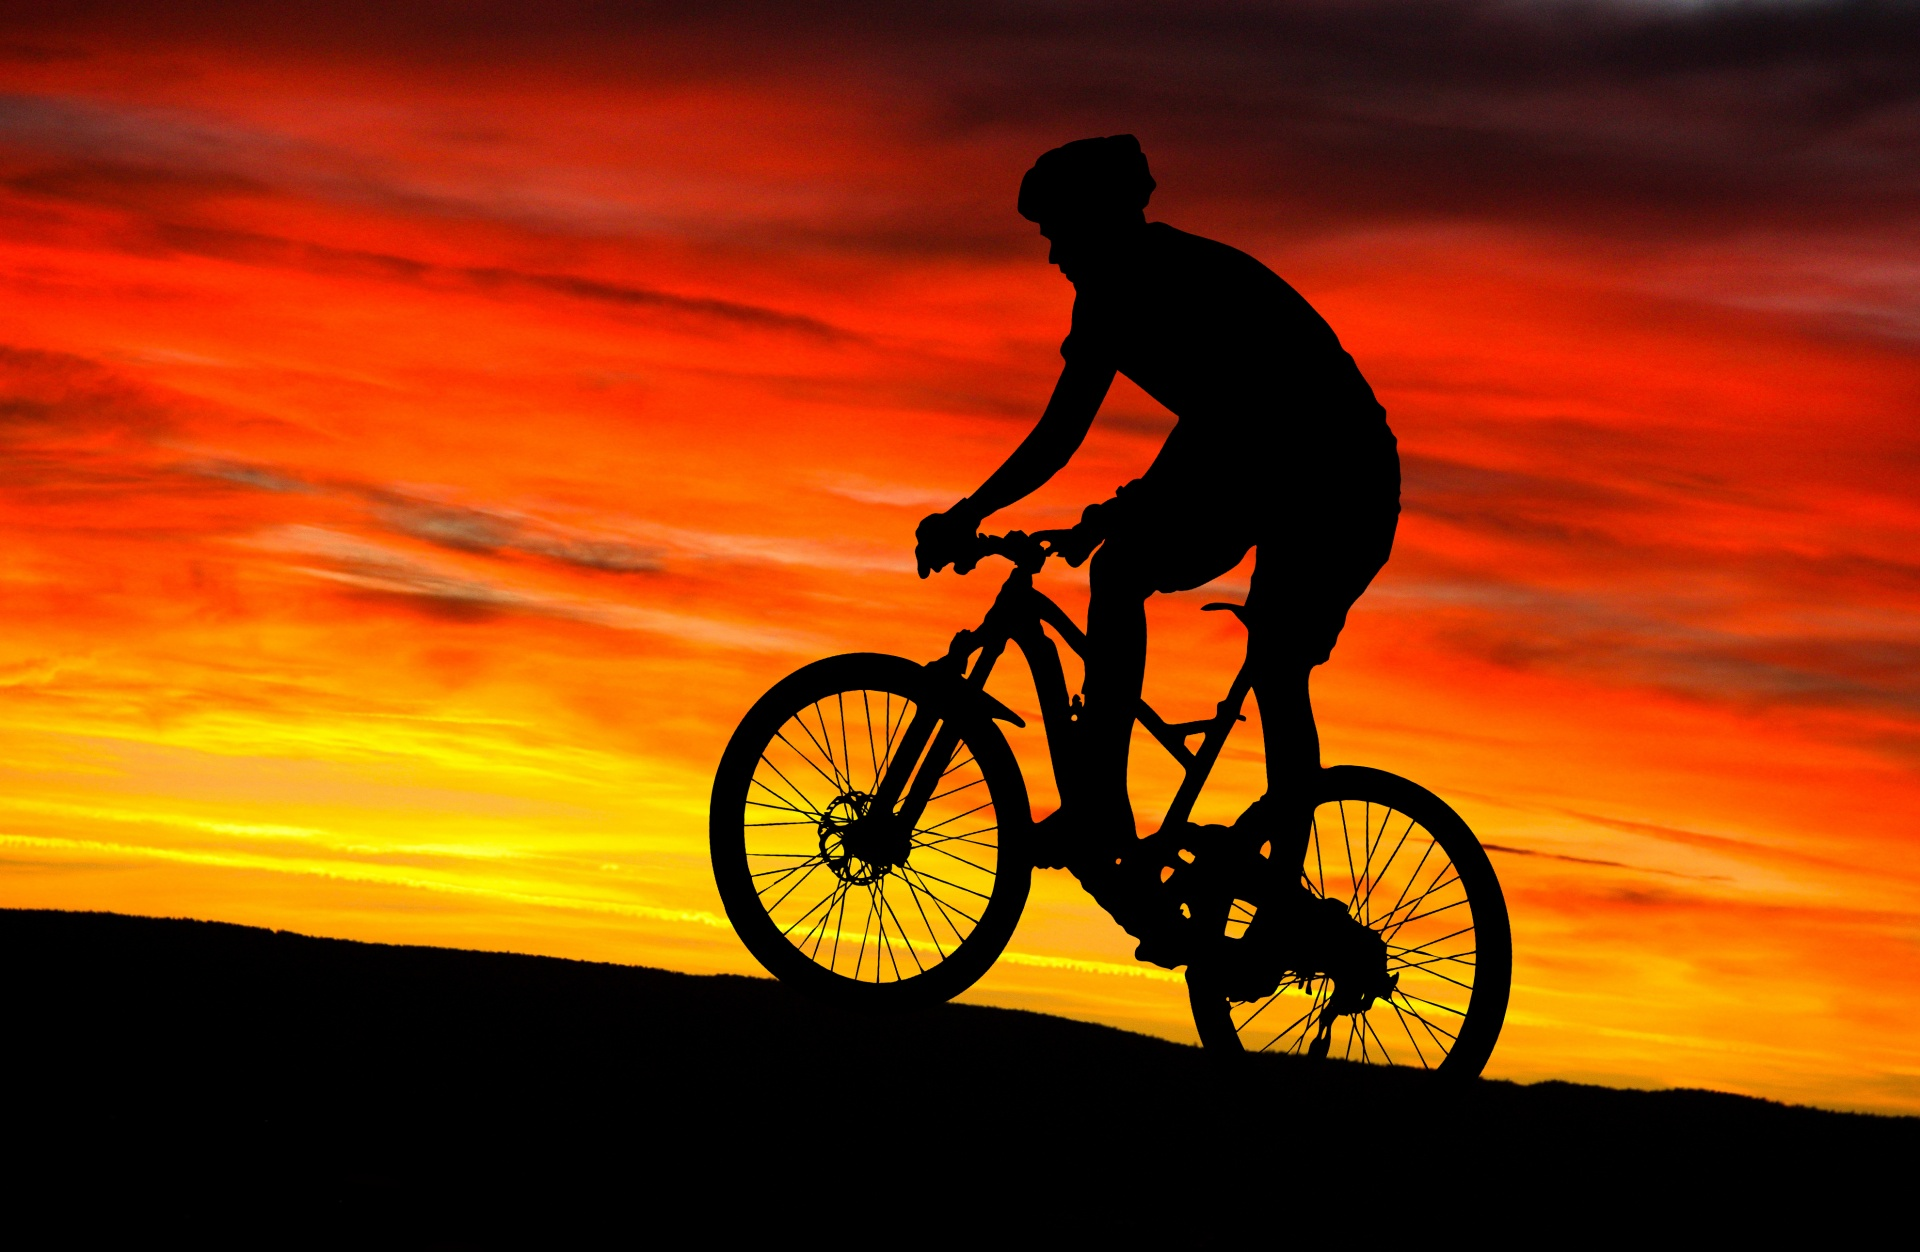 Wallpaper Black Orange Mountain Bike Rider Sunset Free Stock Photo Public